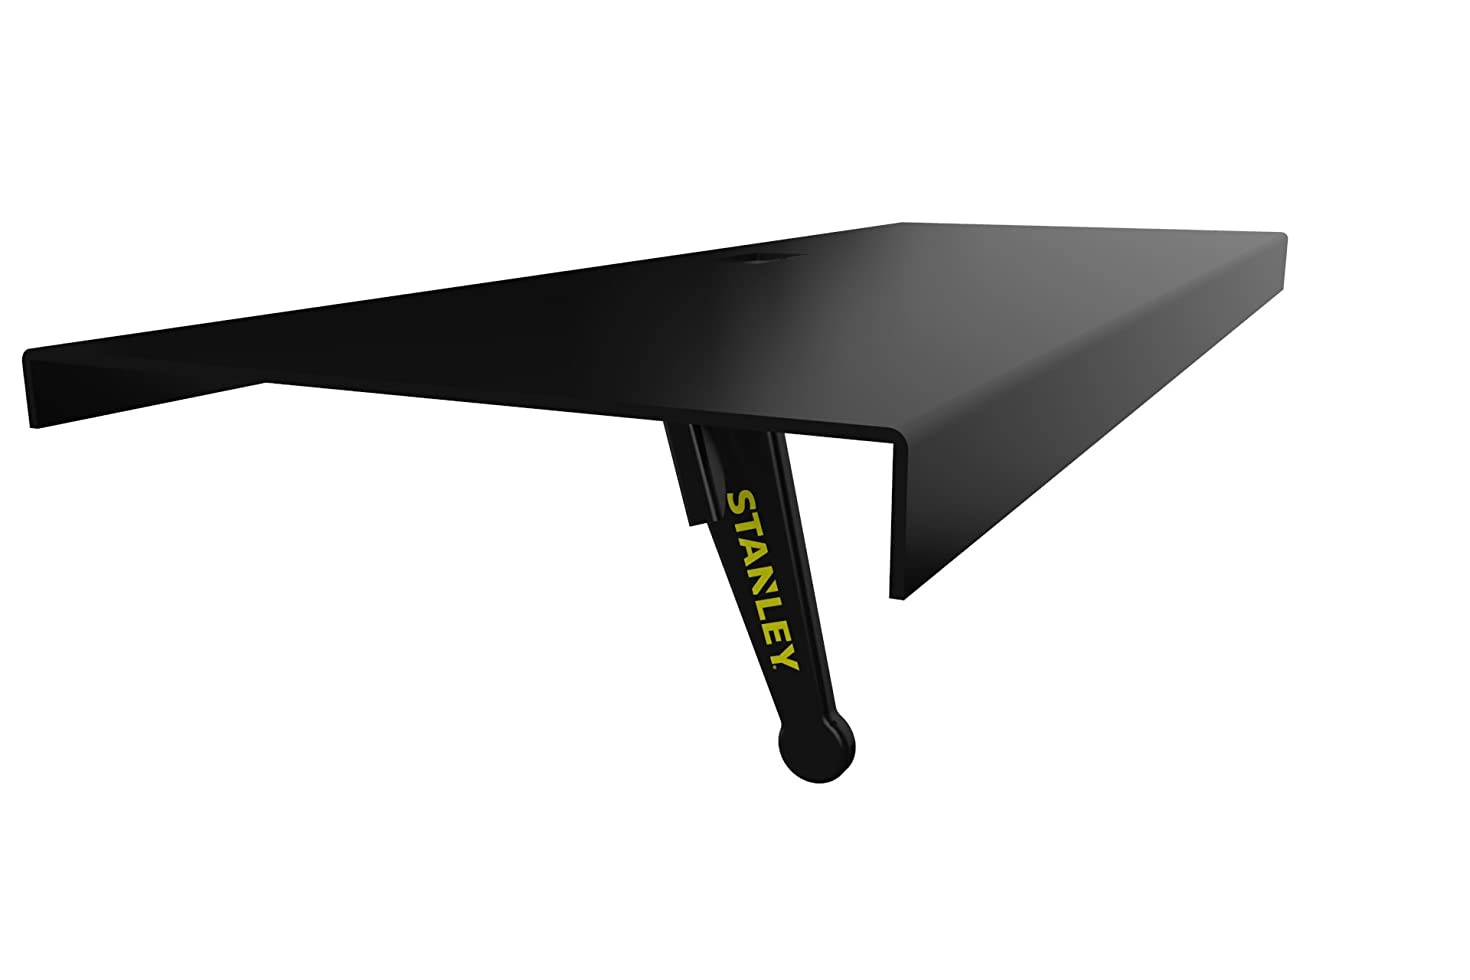 Stanley ATS-112 TV Top Shelf-Medium Size, 12-Inch Width